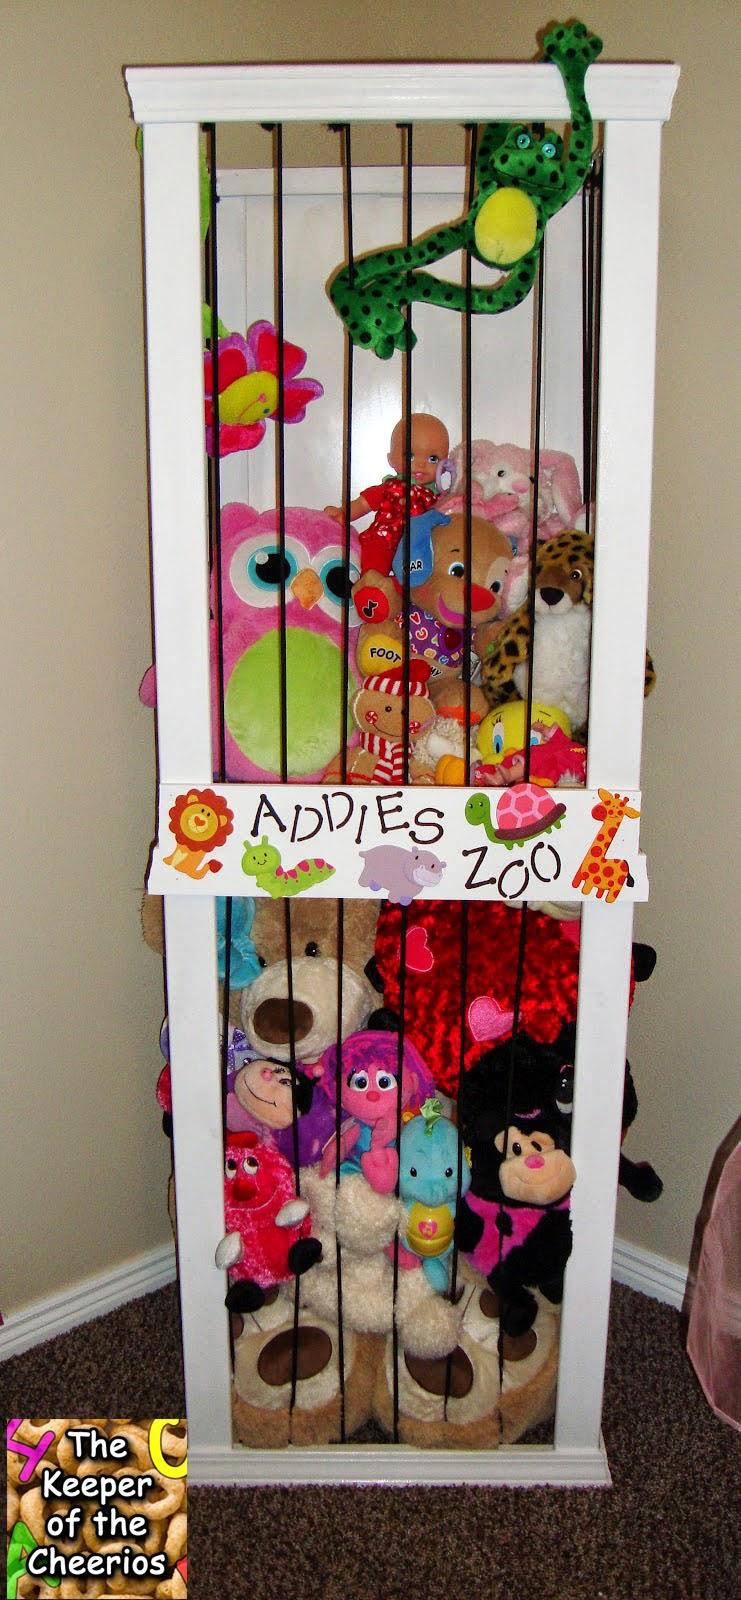 stuffed animal storage solutions. Black Bedroom Furniture Sets. Home Design Ideas